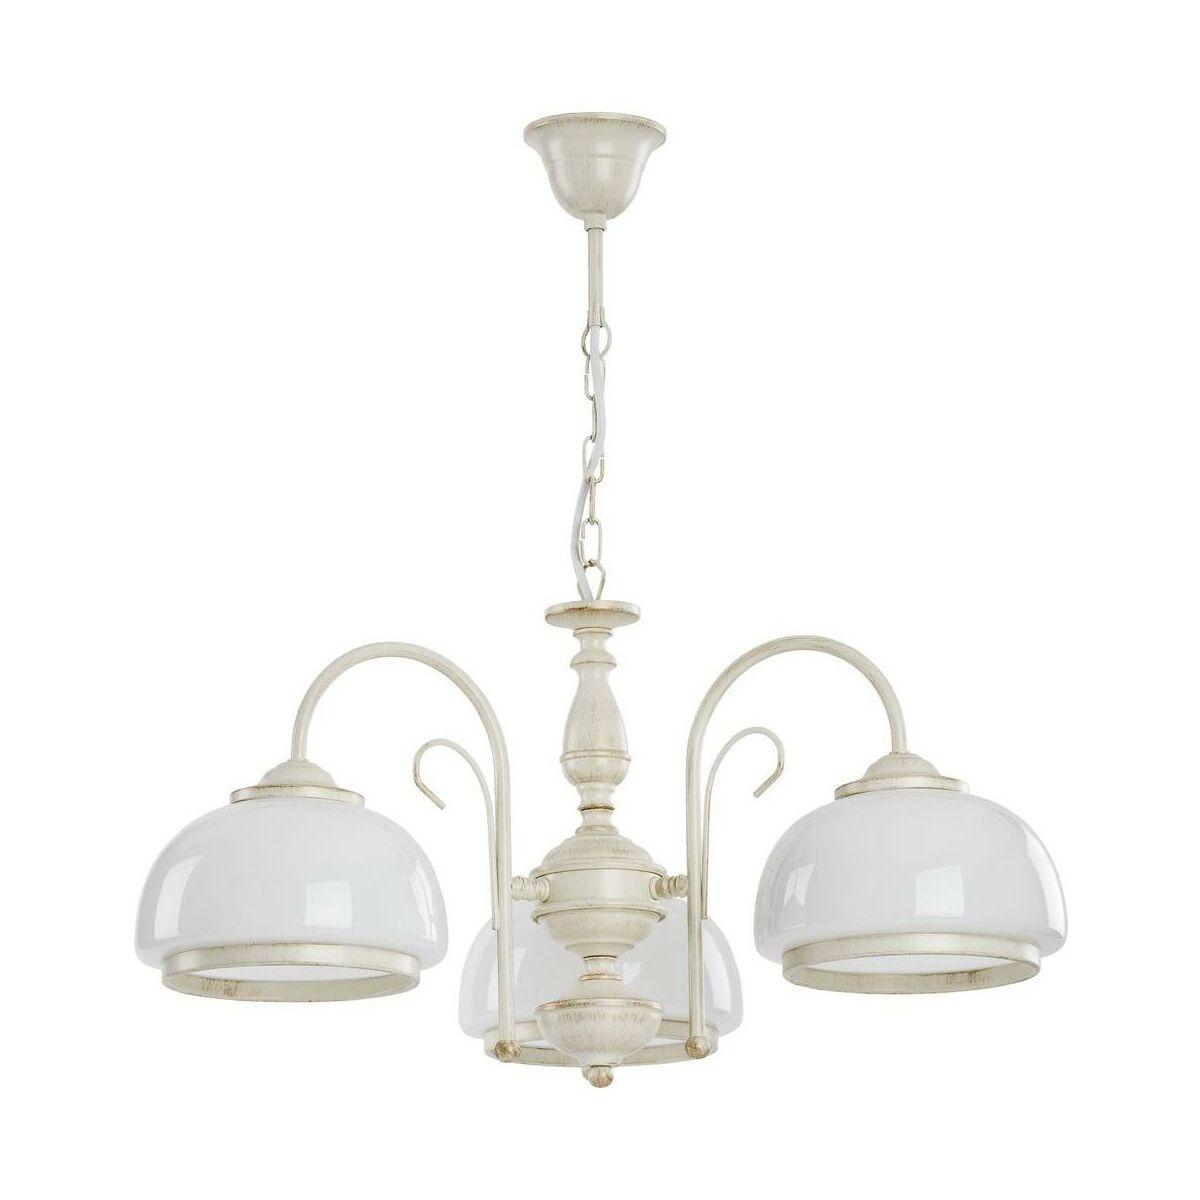 Yrandol paris serie lamp w atrakcyjnej cenie w for Le roy merlin paris